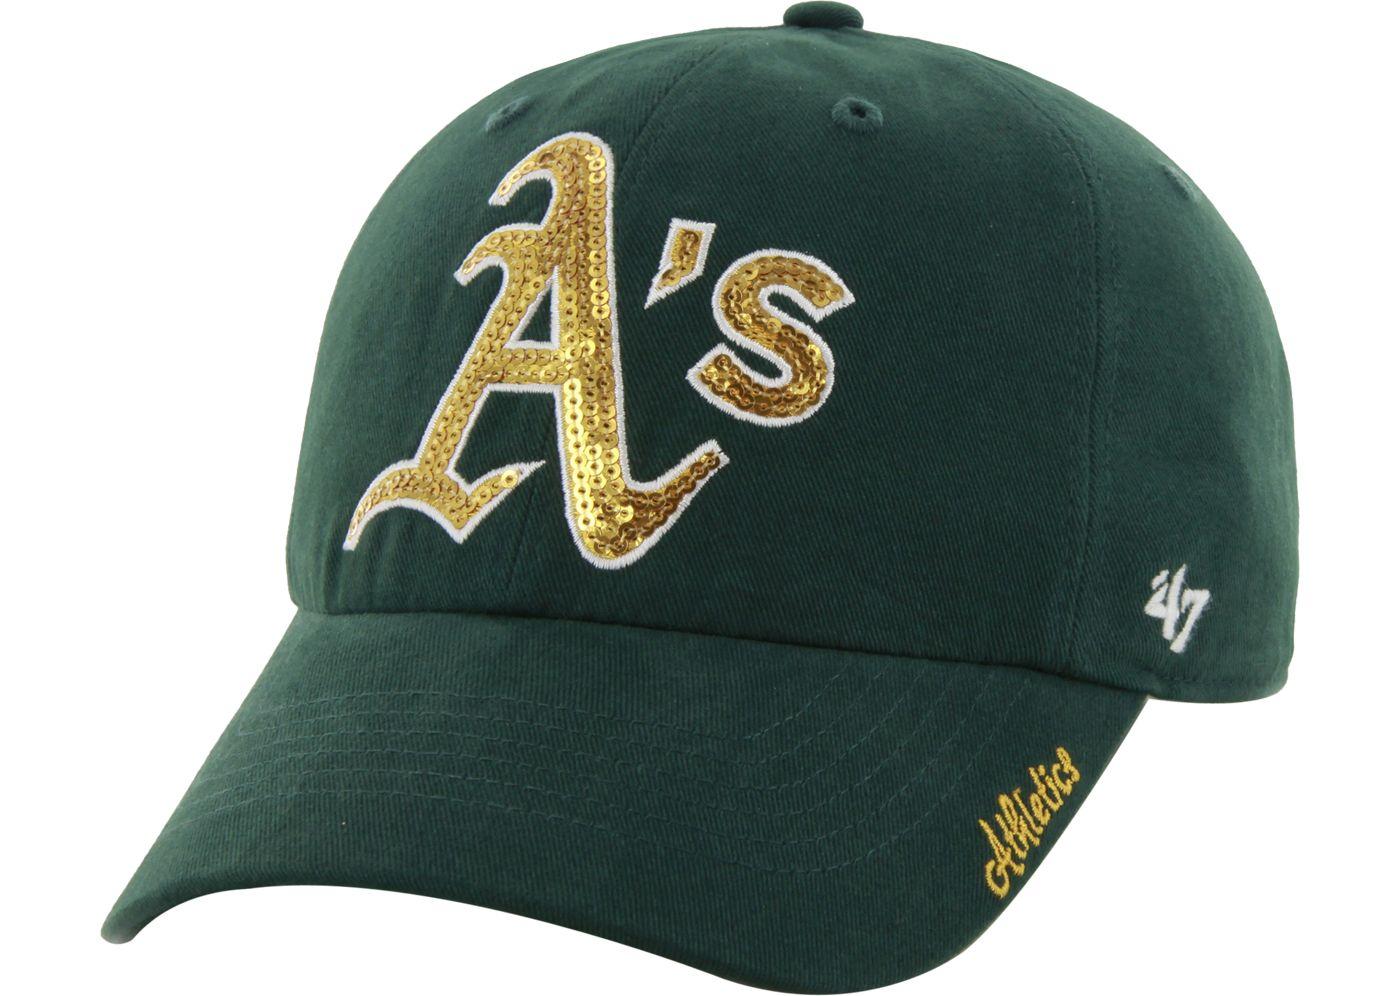 '47 Women's Oakland Athletics Sparkle Green Adjustable Hat